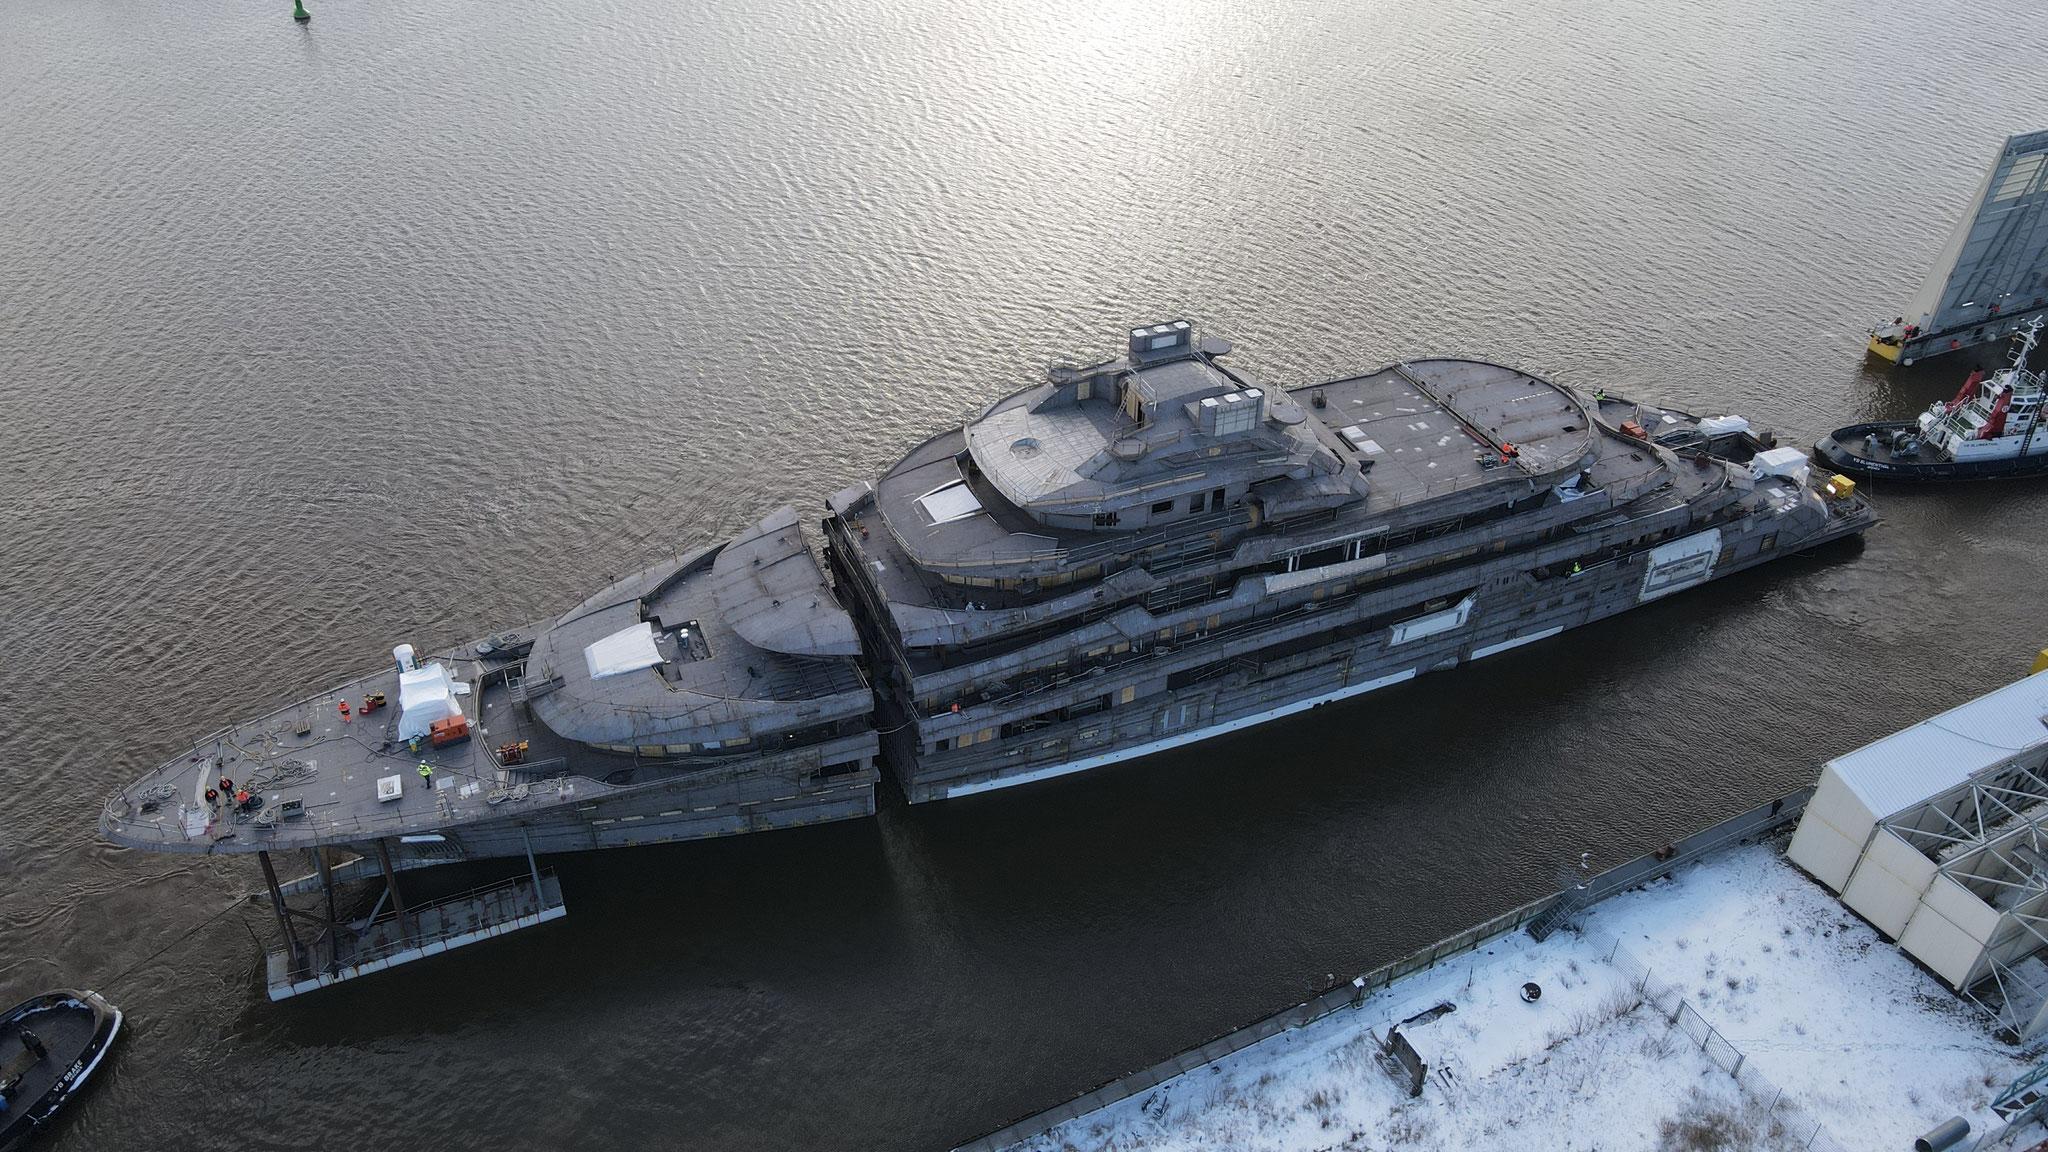 Brand new Yachts hulls